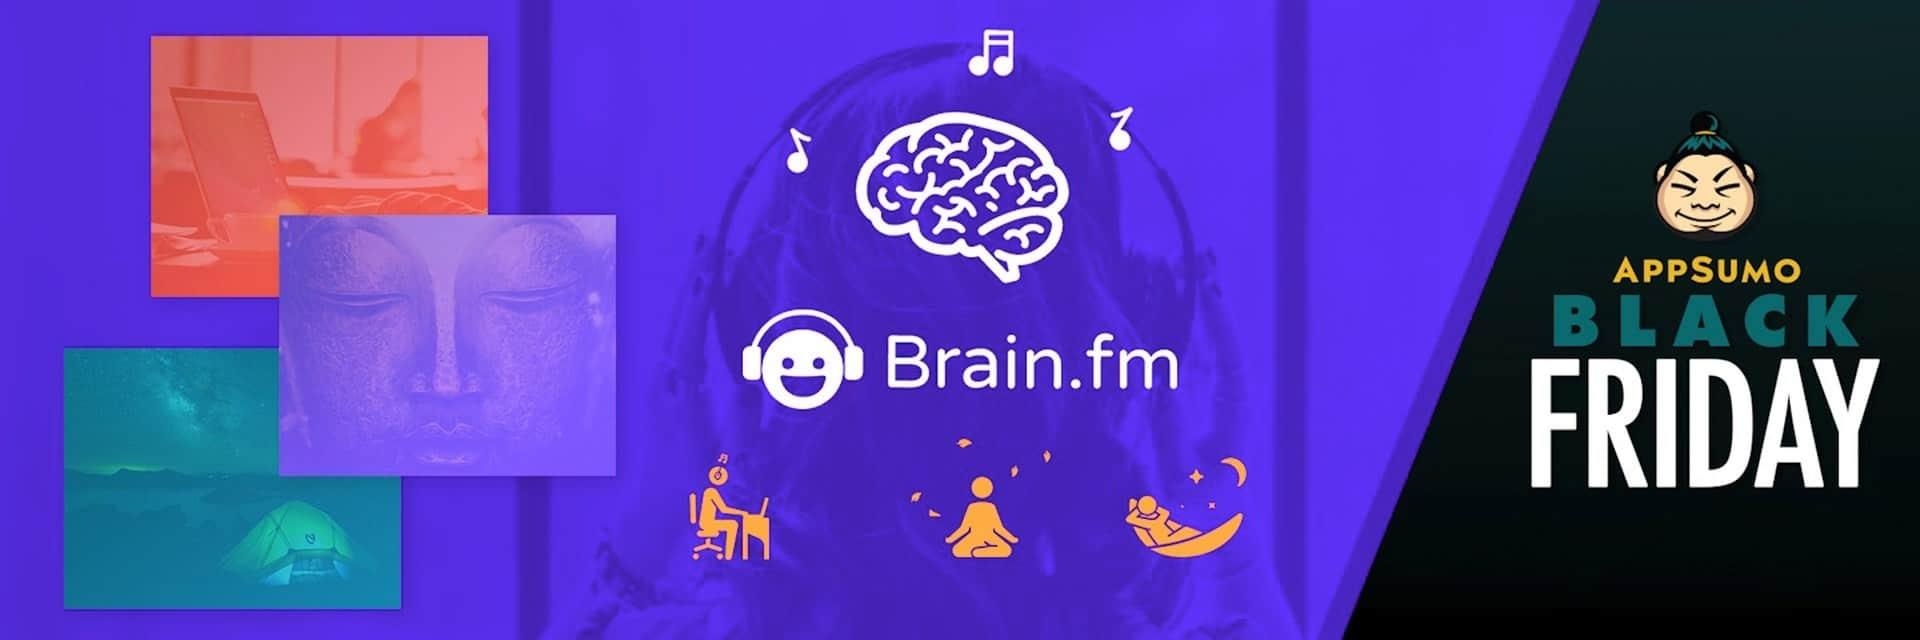 Brain.fm